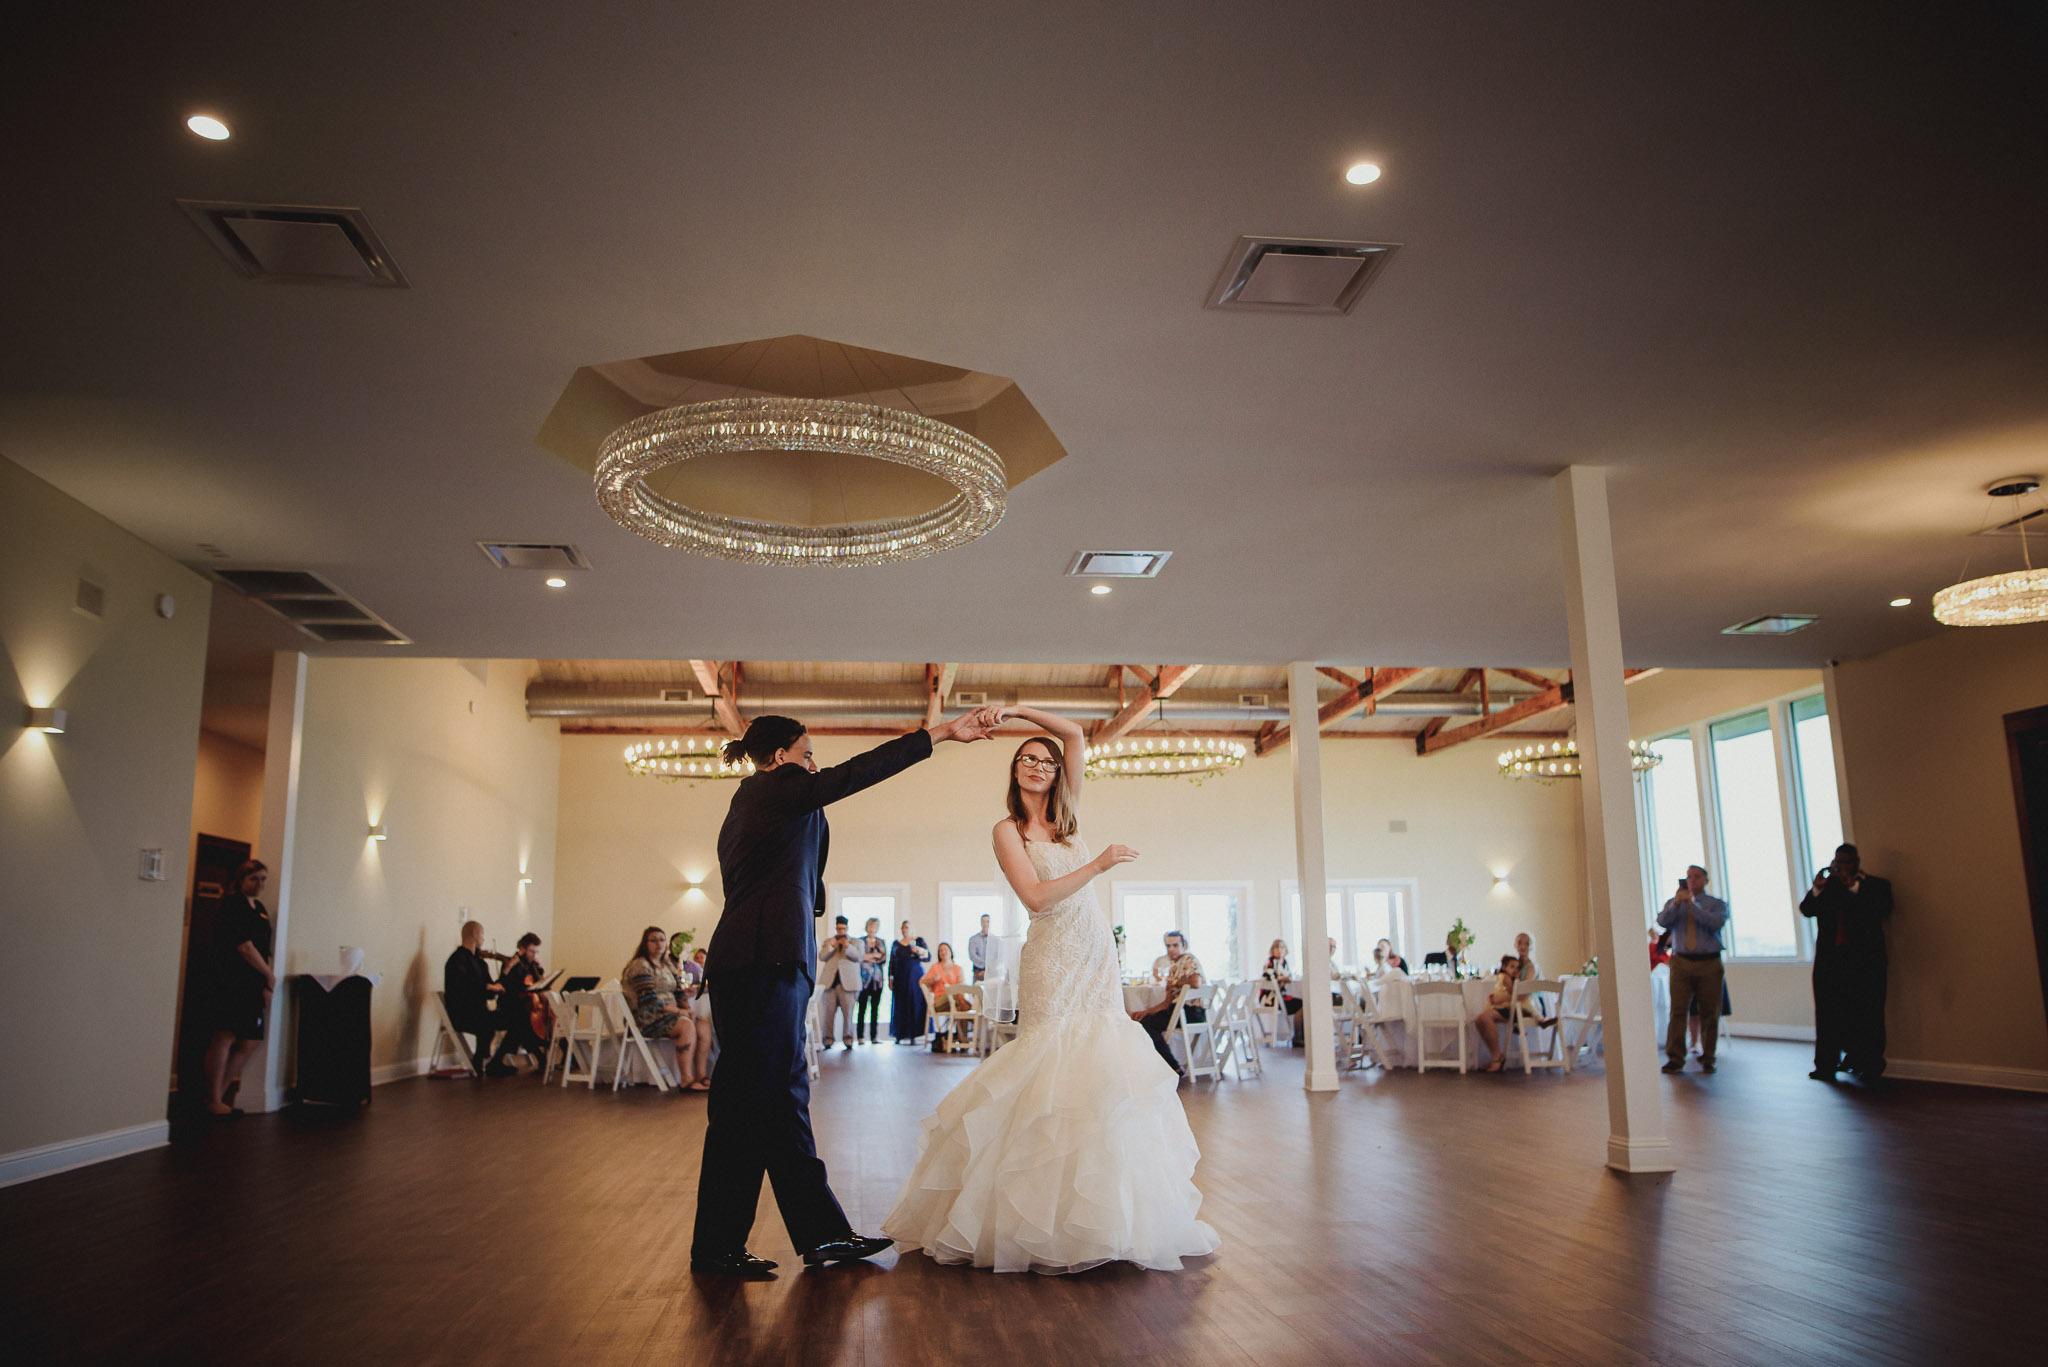 Austin-Texas-Wedding-Vintage-Villas-0036.jpg